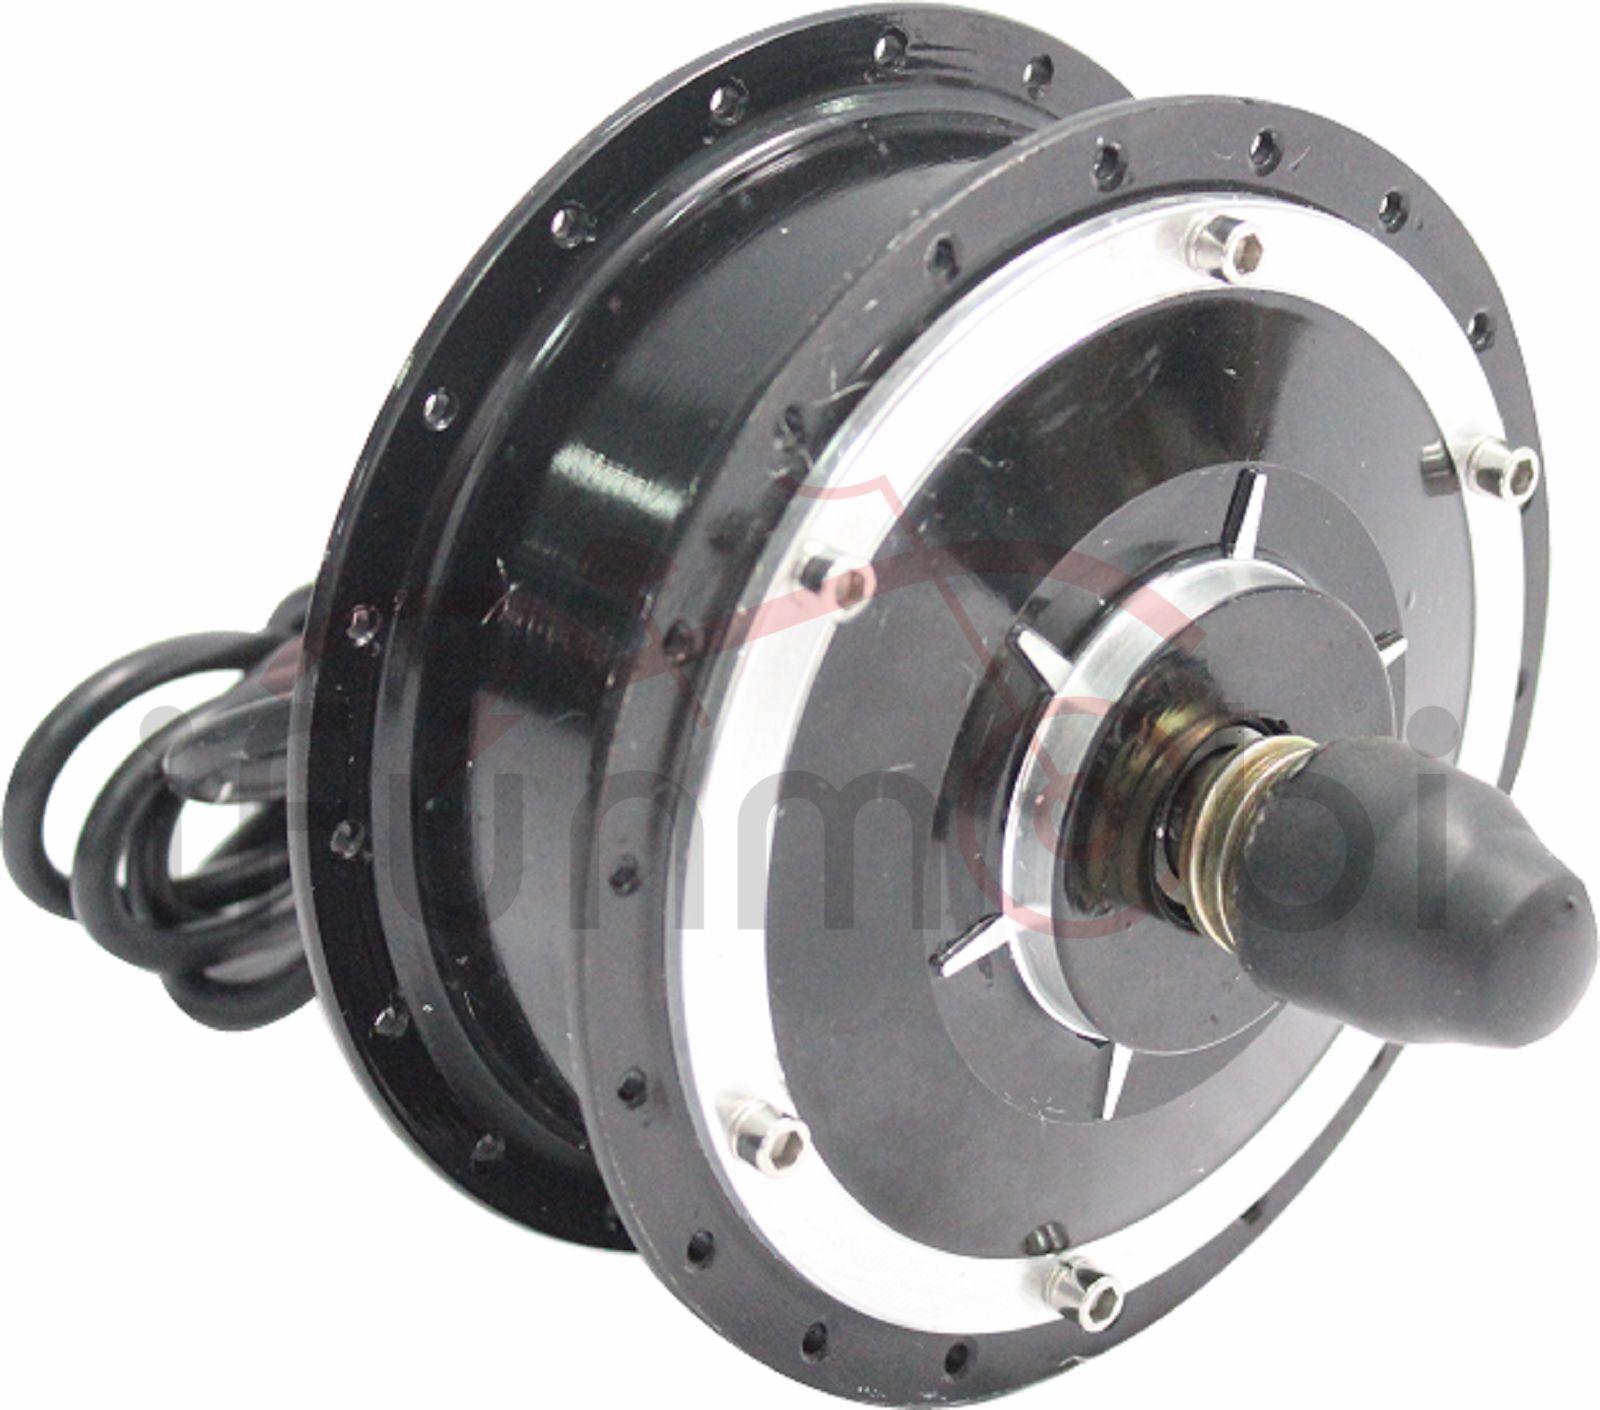 24V 36V 48V 250W Brushless Gearless  Mini Hub Motor Front Wheel Motor For E-Bike  for your style of play at the cheapest prices